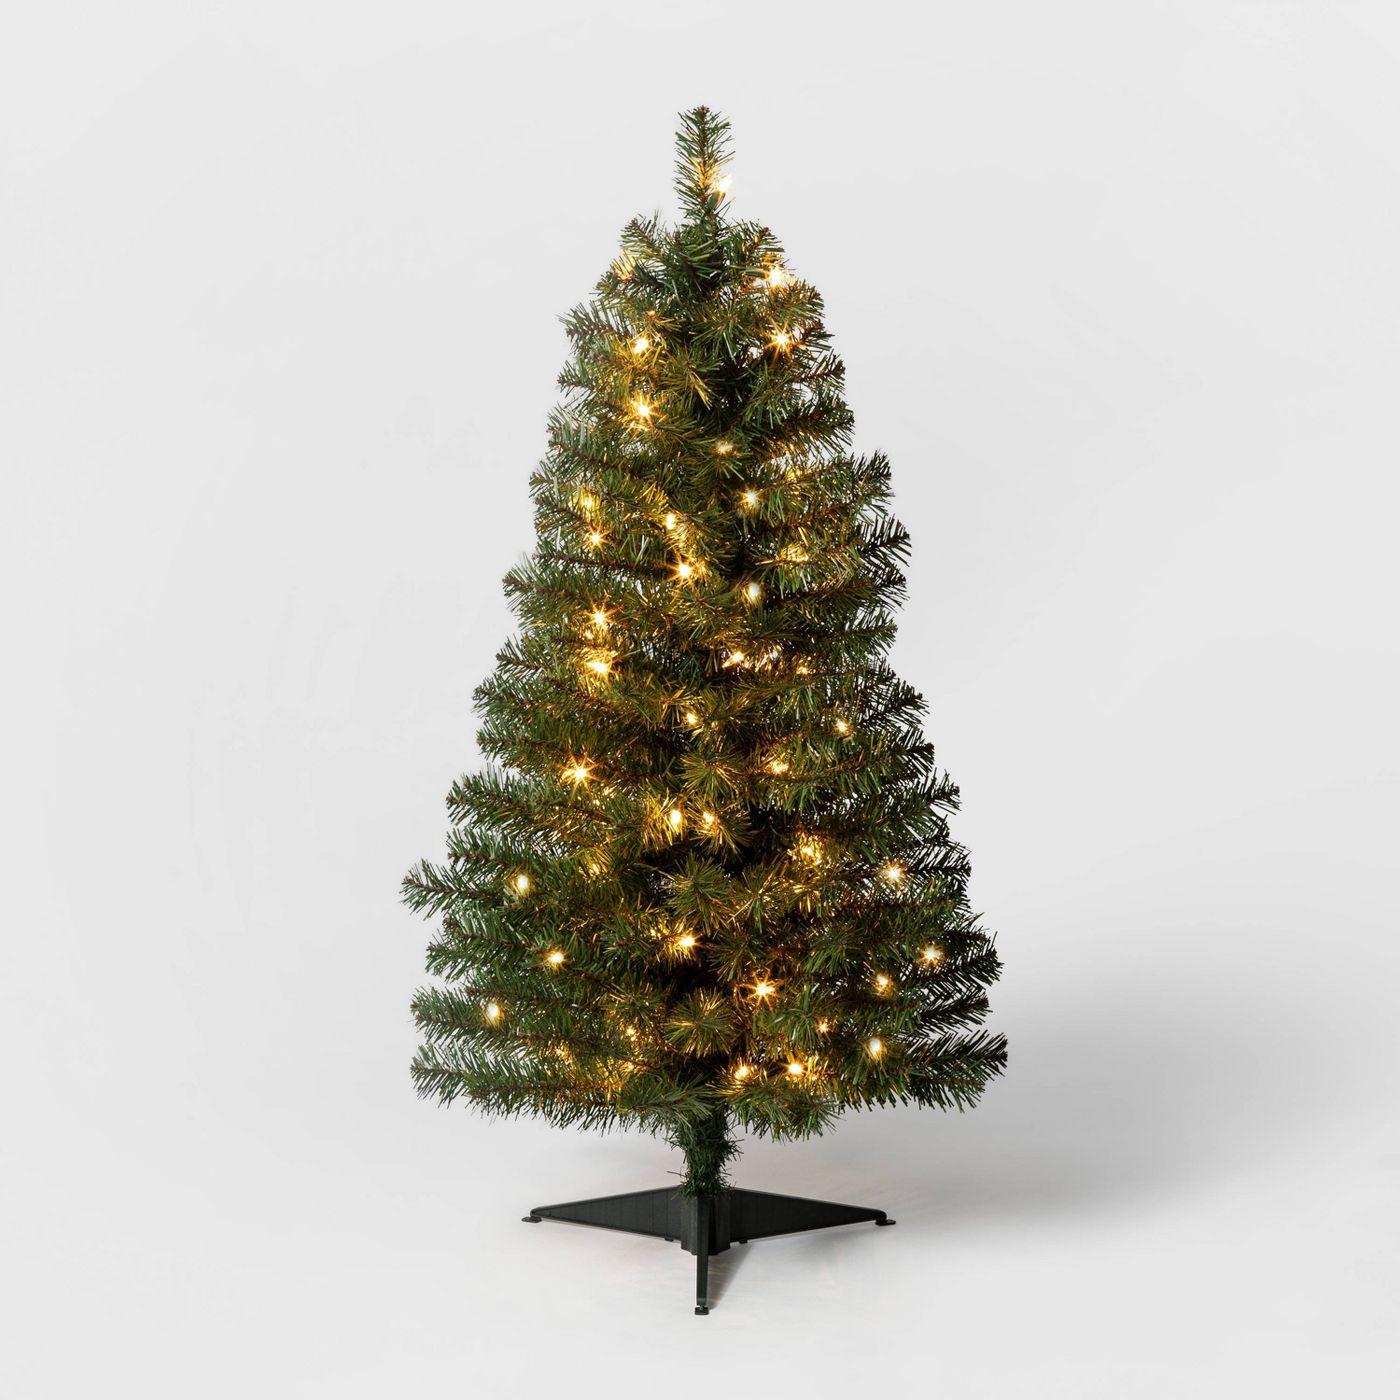 Wondershop 3ft. Pre-Lit Alberta Spruce Lights Artificial Christmas Tree